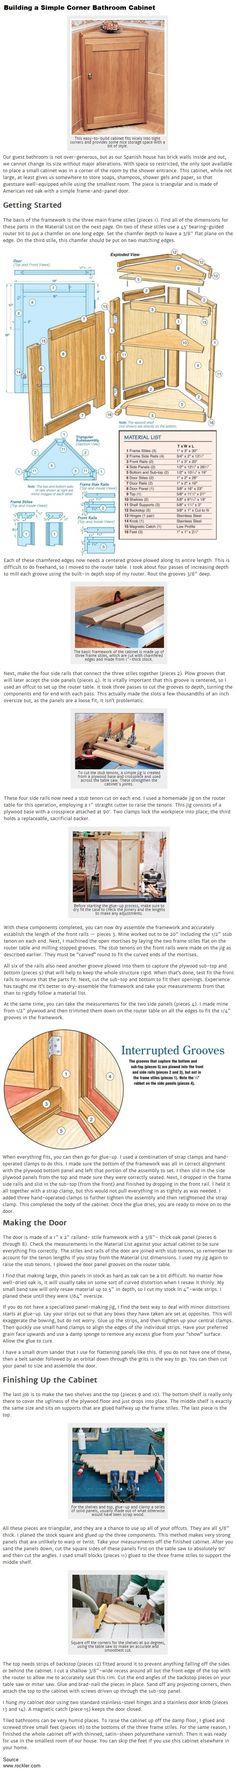 Building a Simple Corner Bathroom Cabinet   WoodworkerZ.com